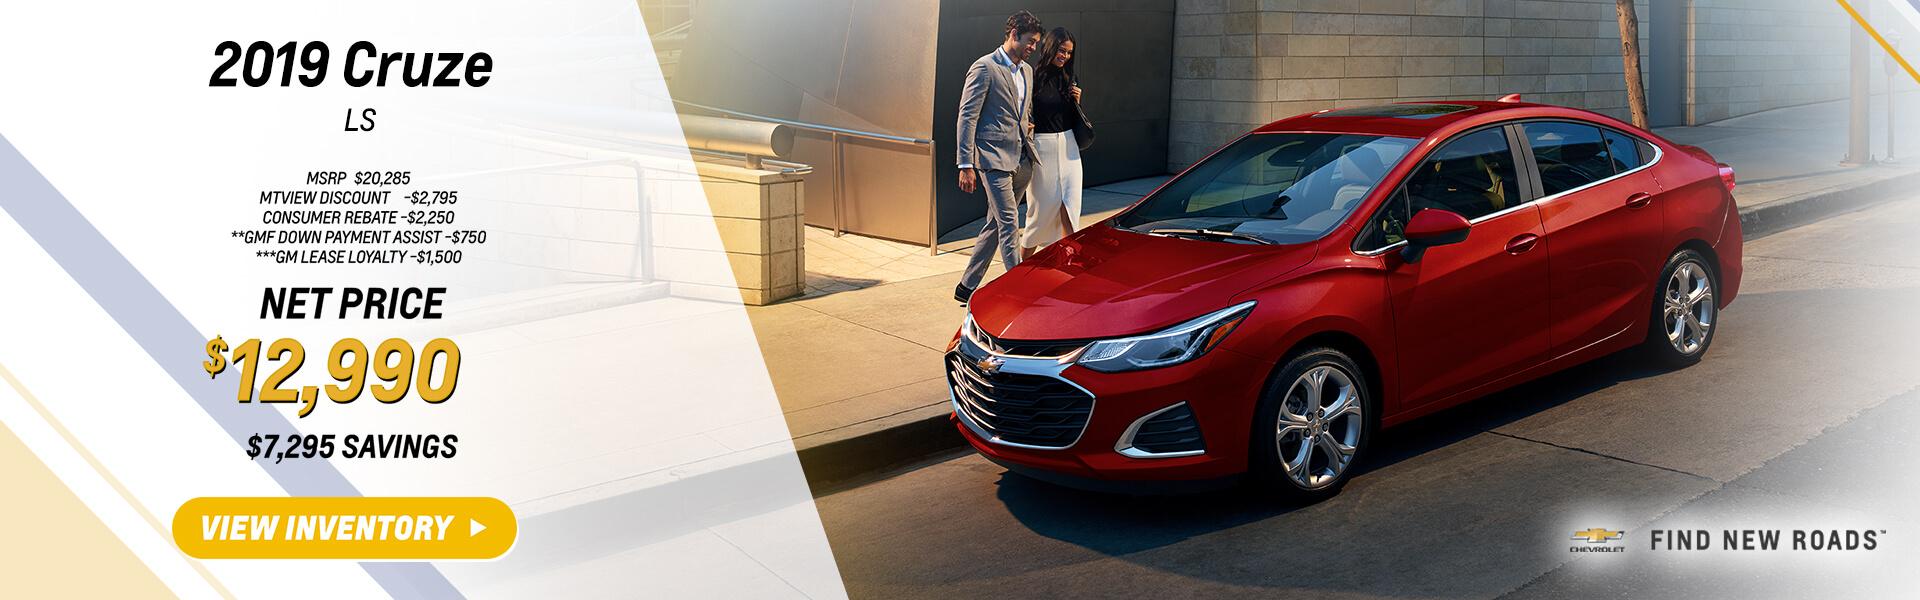 New & Used Chevrolet Dealer | Rancho Cucamonga, Pomona ...